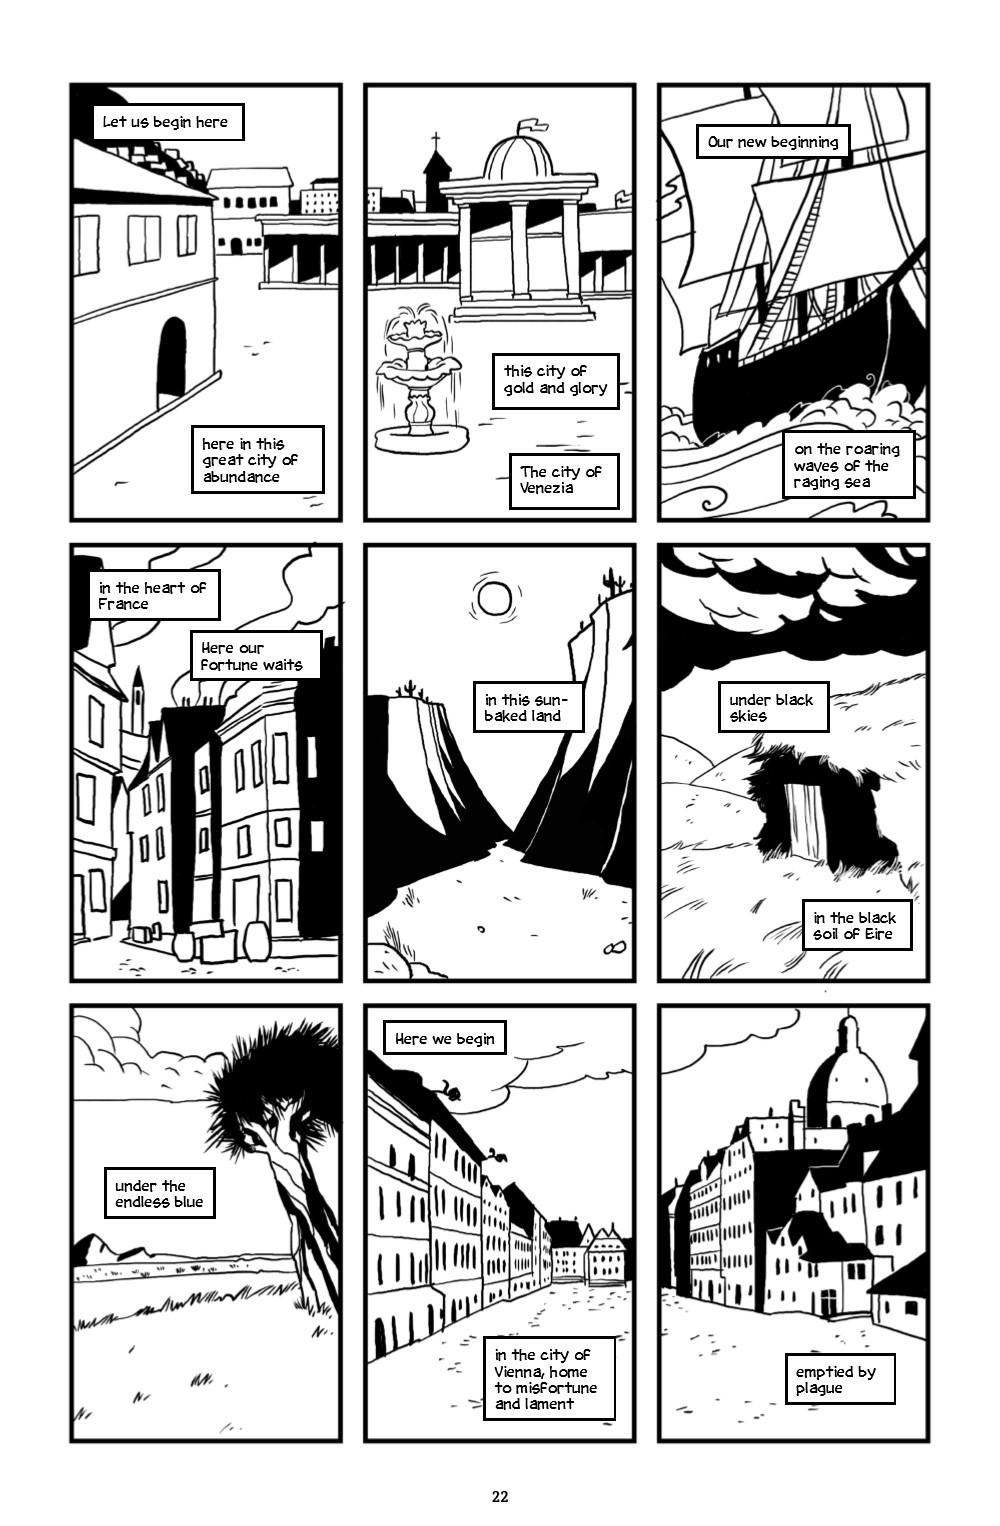 ONELINE-HC-MARKETING-023 ComicList Previews: ONE LINE HC